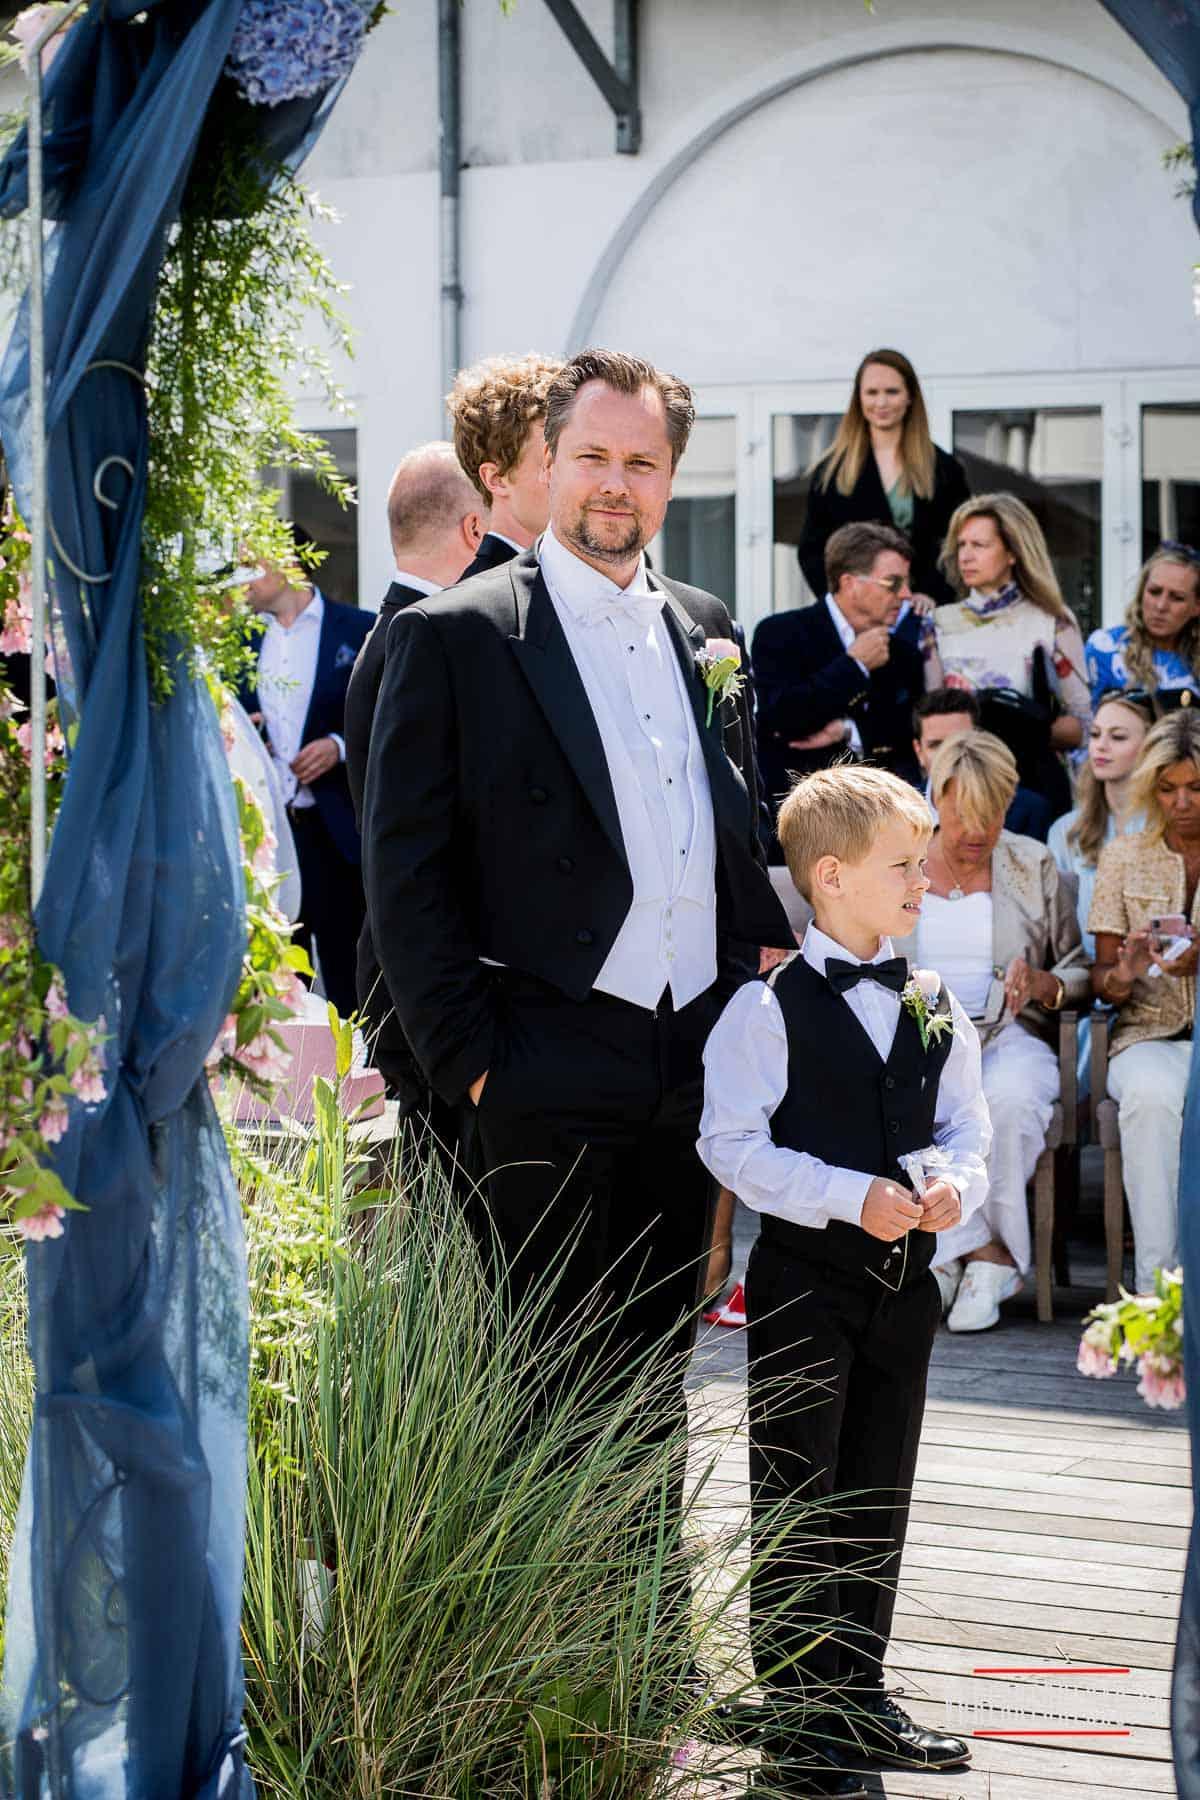 Bryllup i parken med Øresund som baggrund